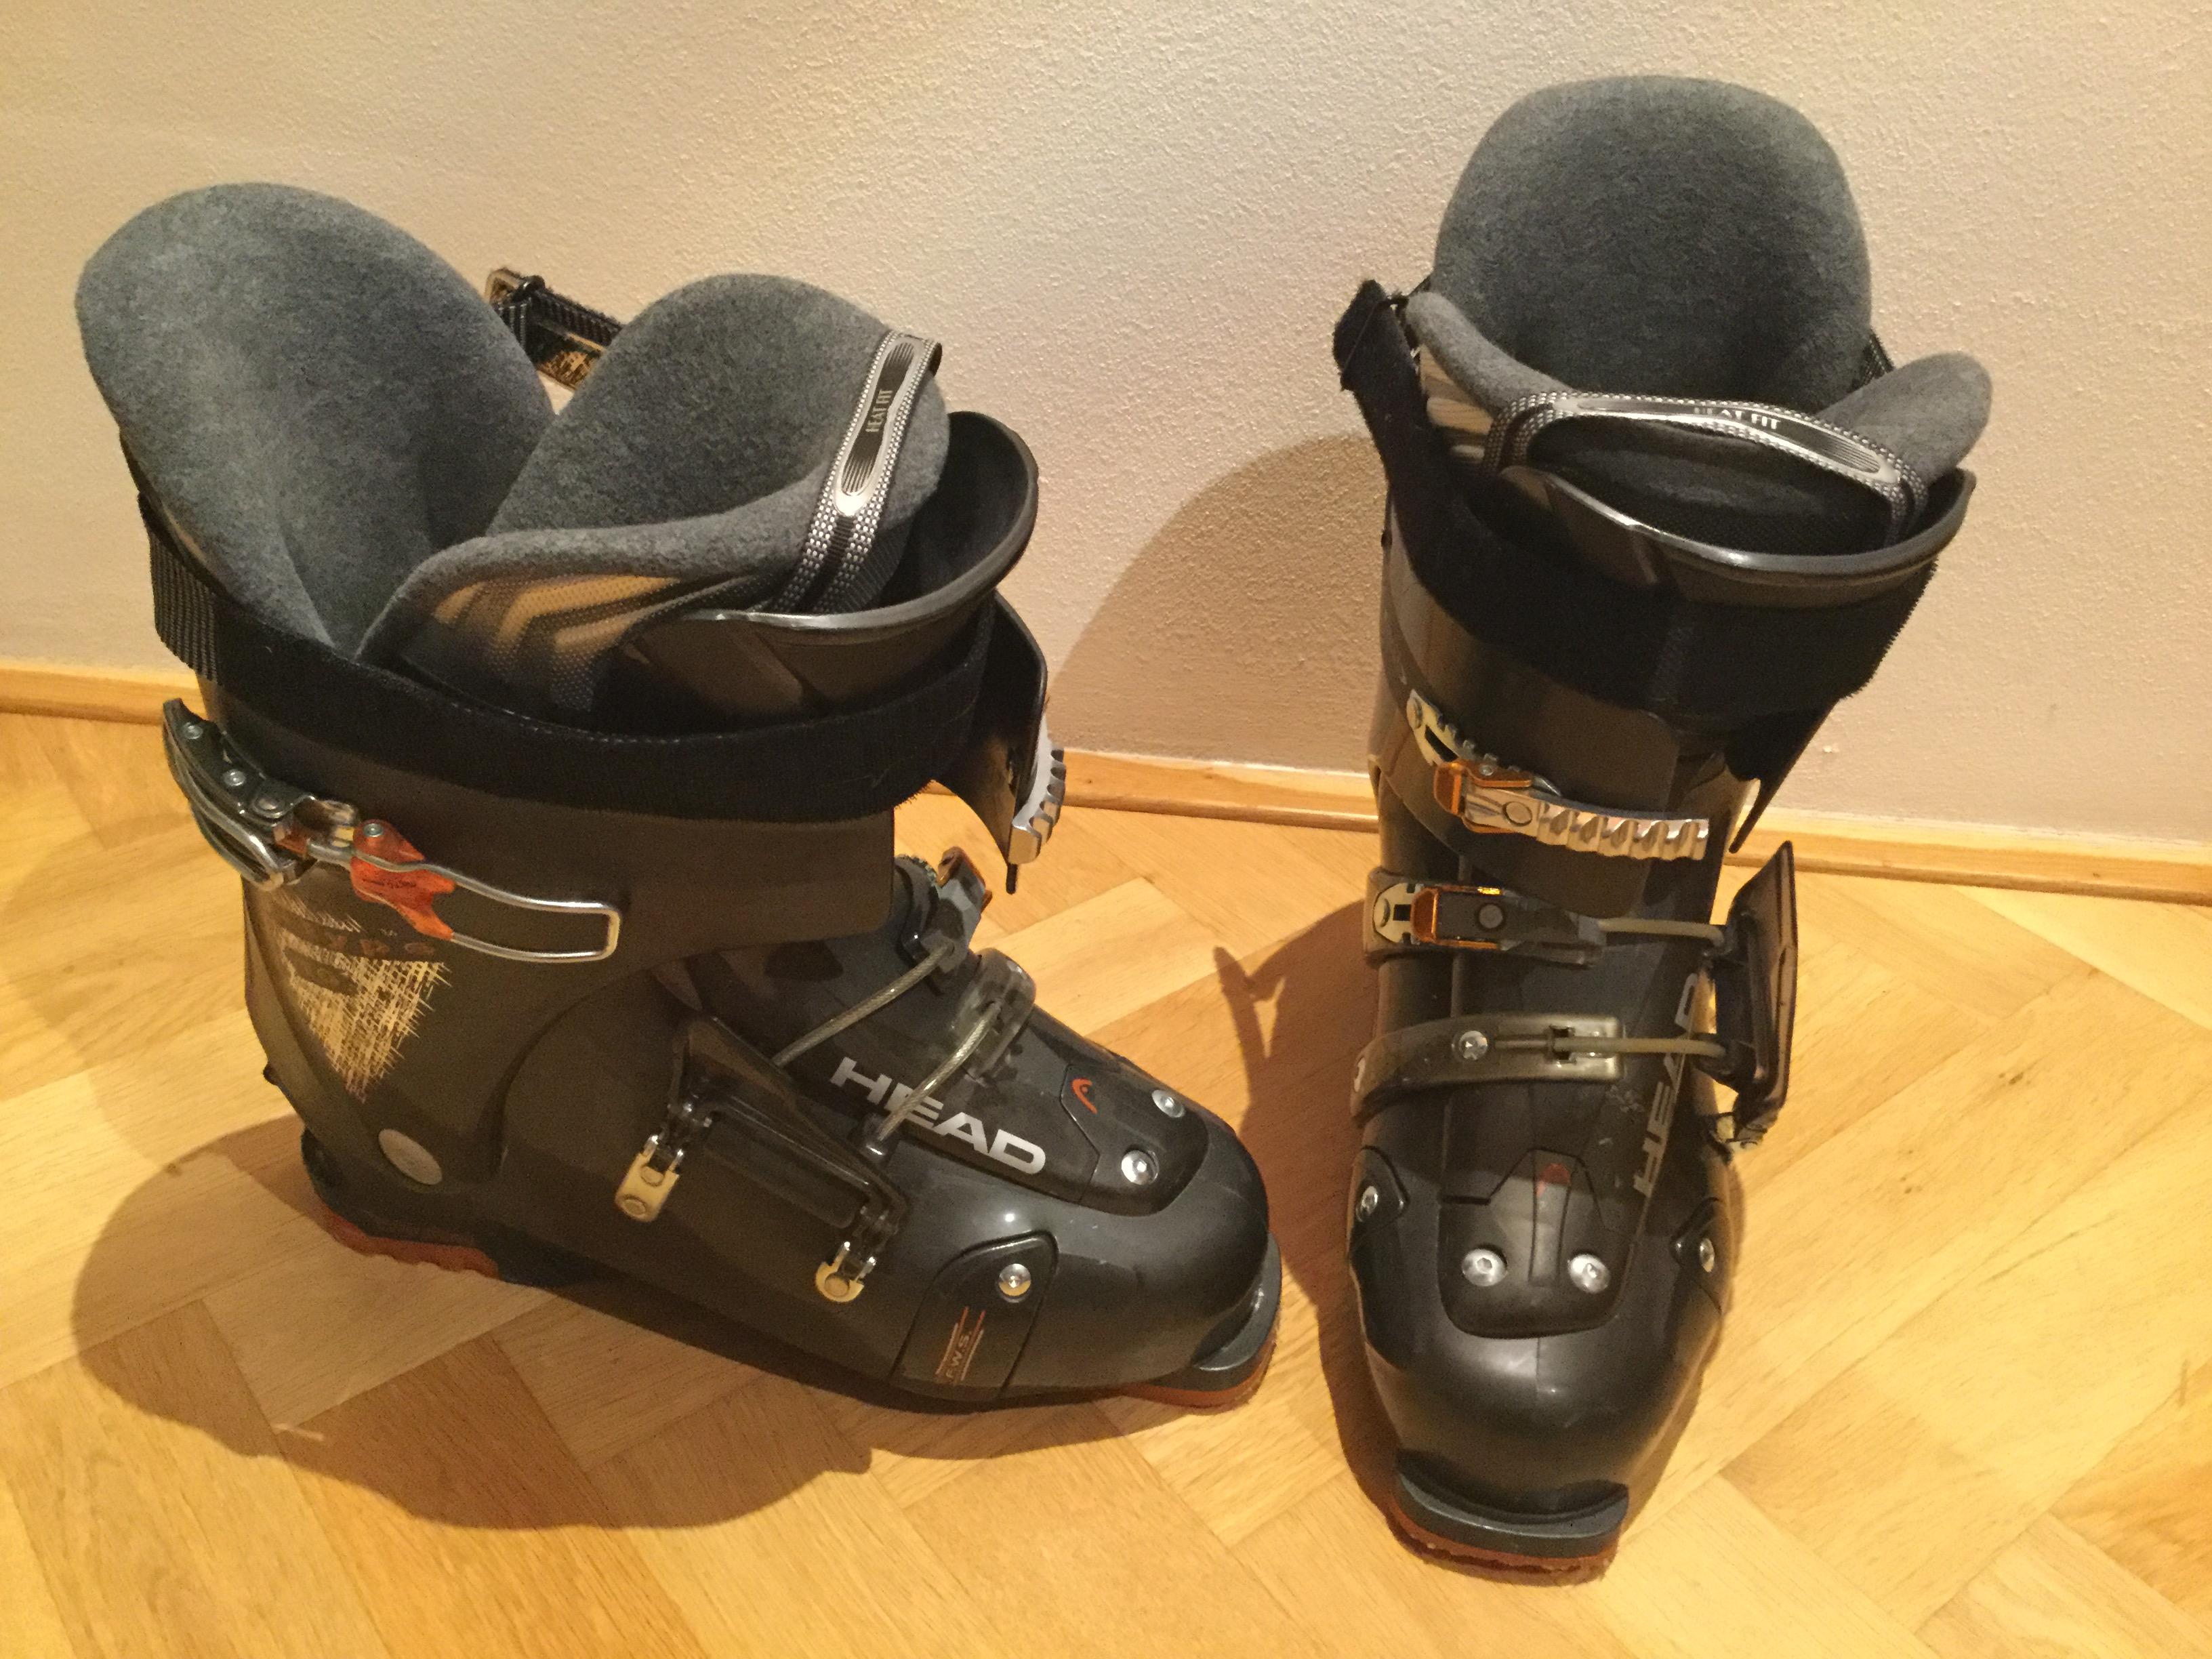 Lyžařské boty HEAD - Bazar - SNOW.CZ 8dc3e67fce